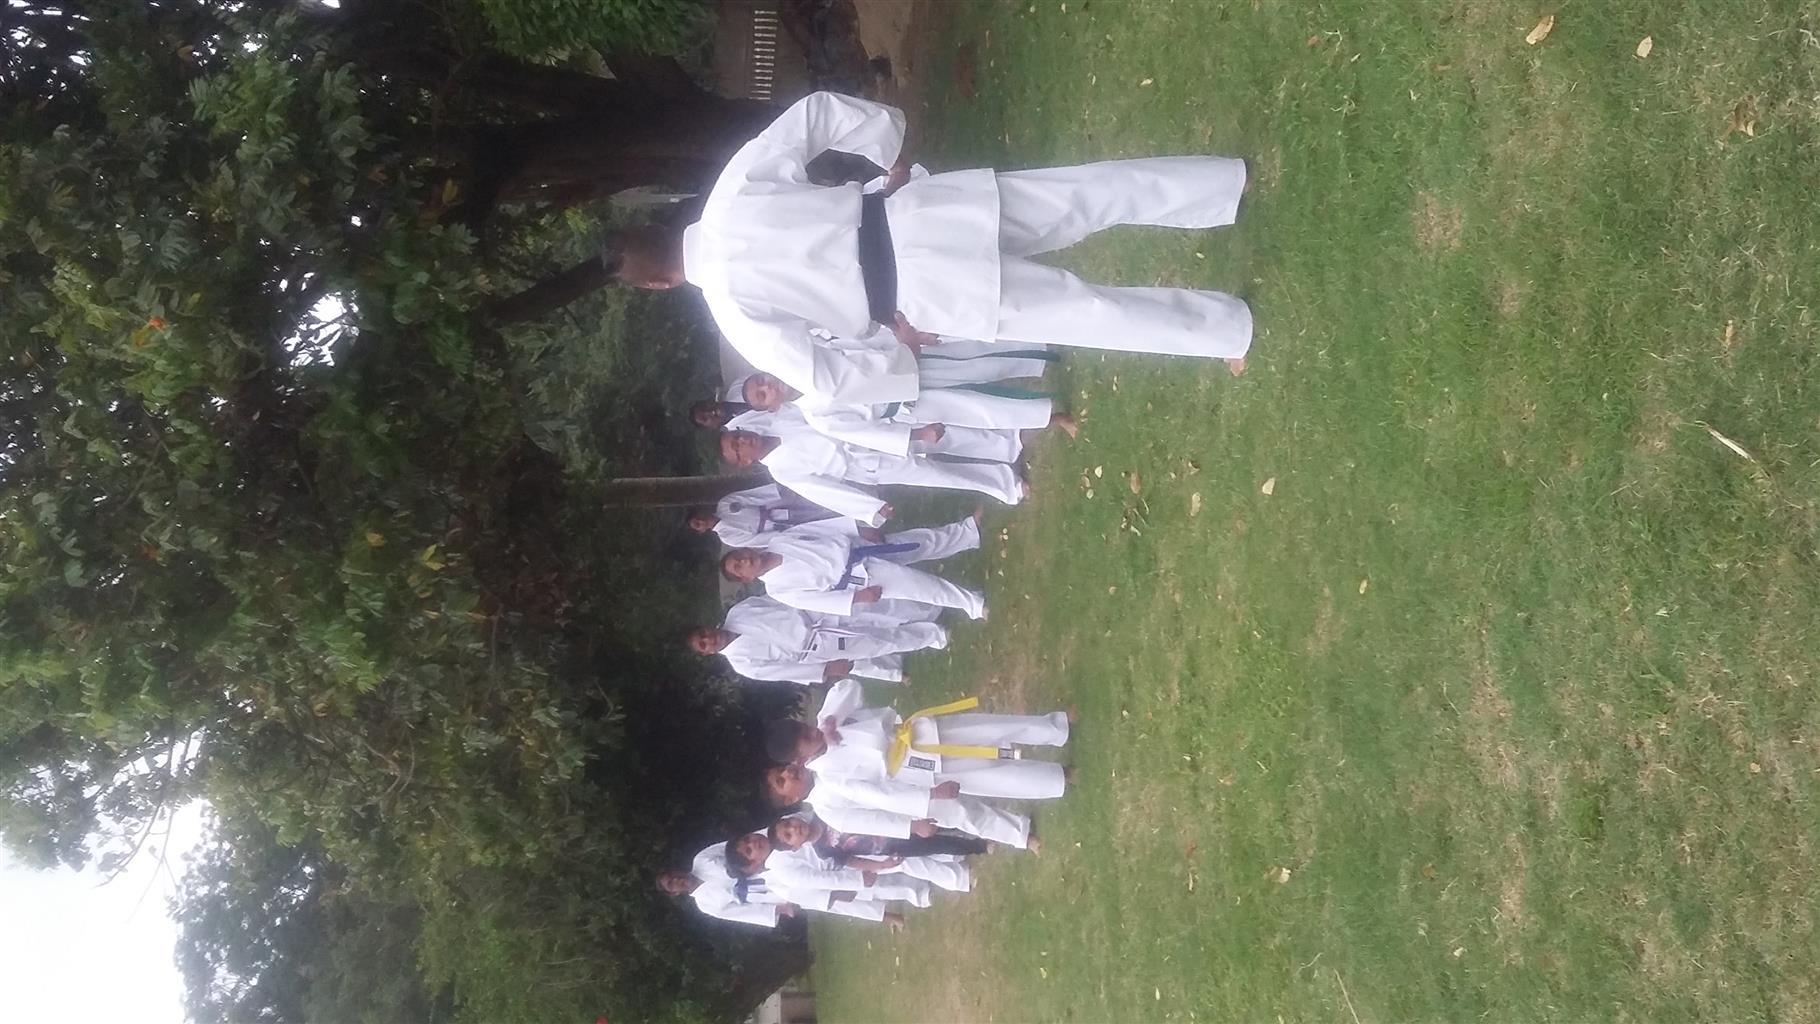 Karate classes in Queensburgh | Junk Mail